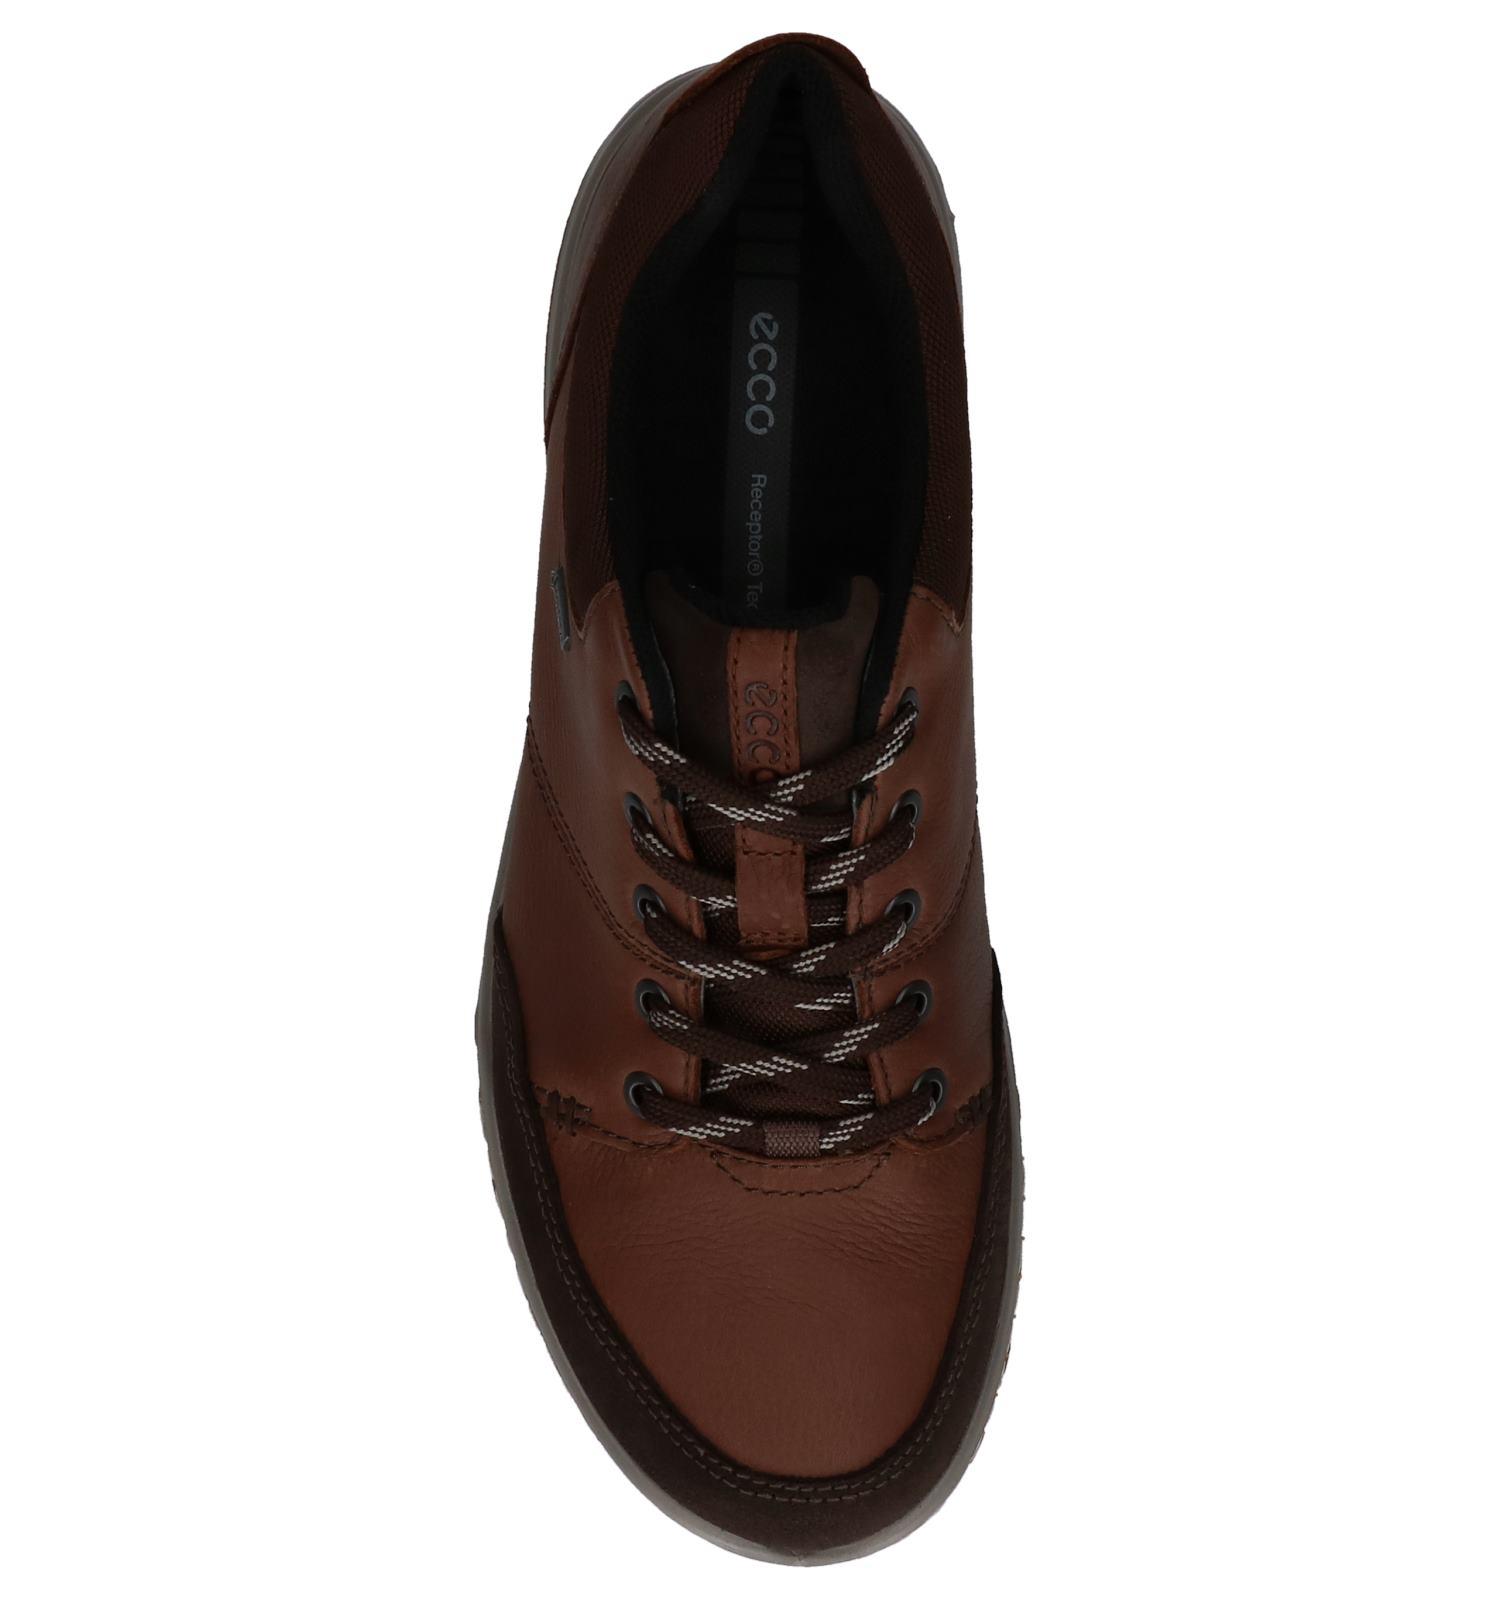 Ecco Casual Urban Bruine Schoenen Lifestyle ZOPukXTi